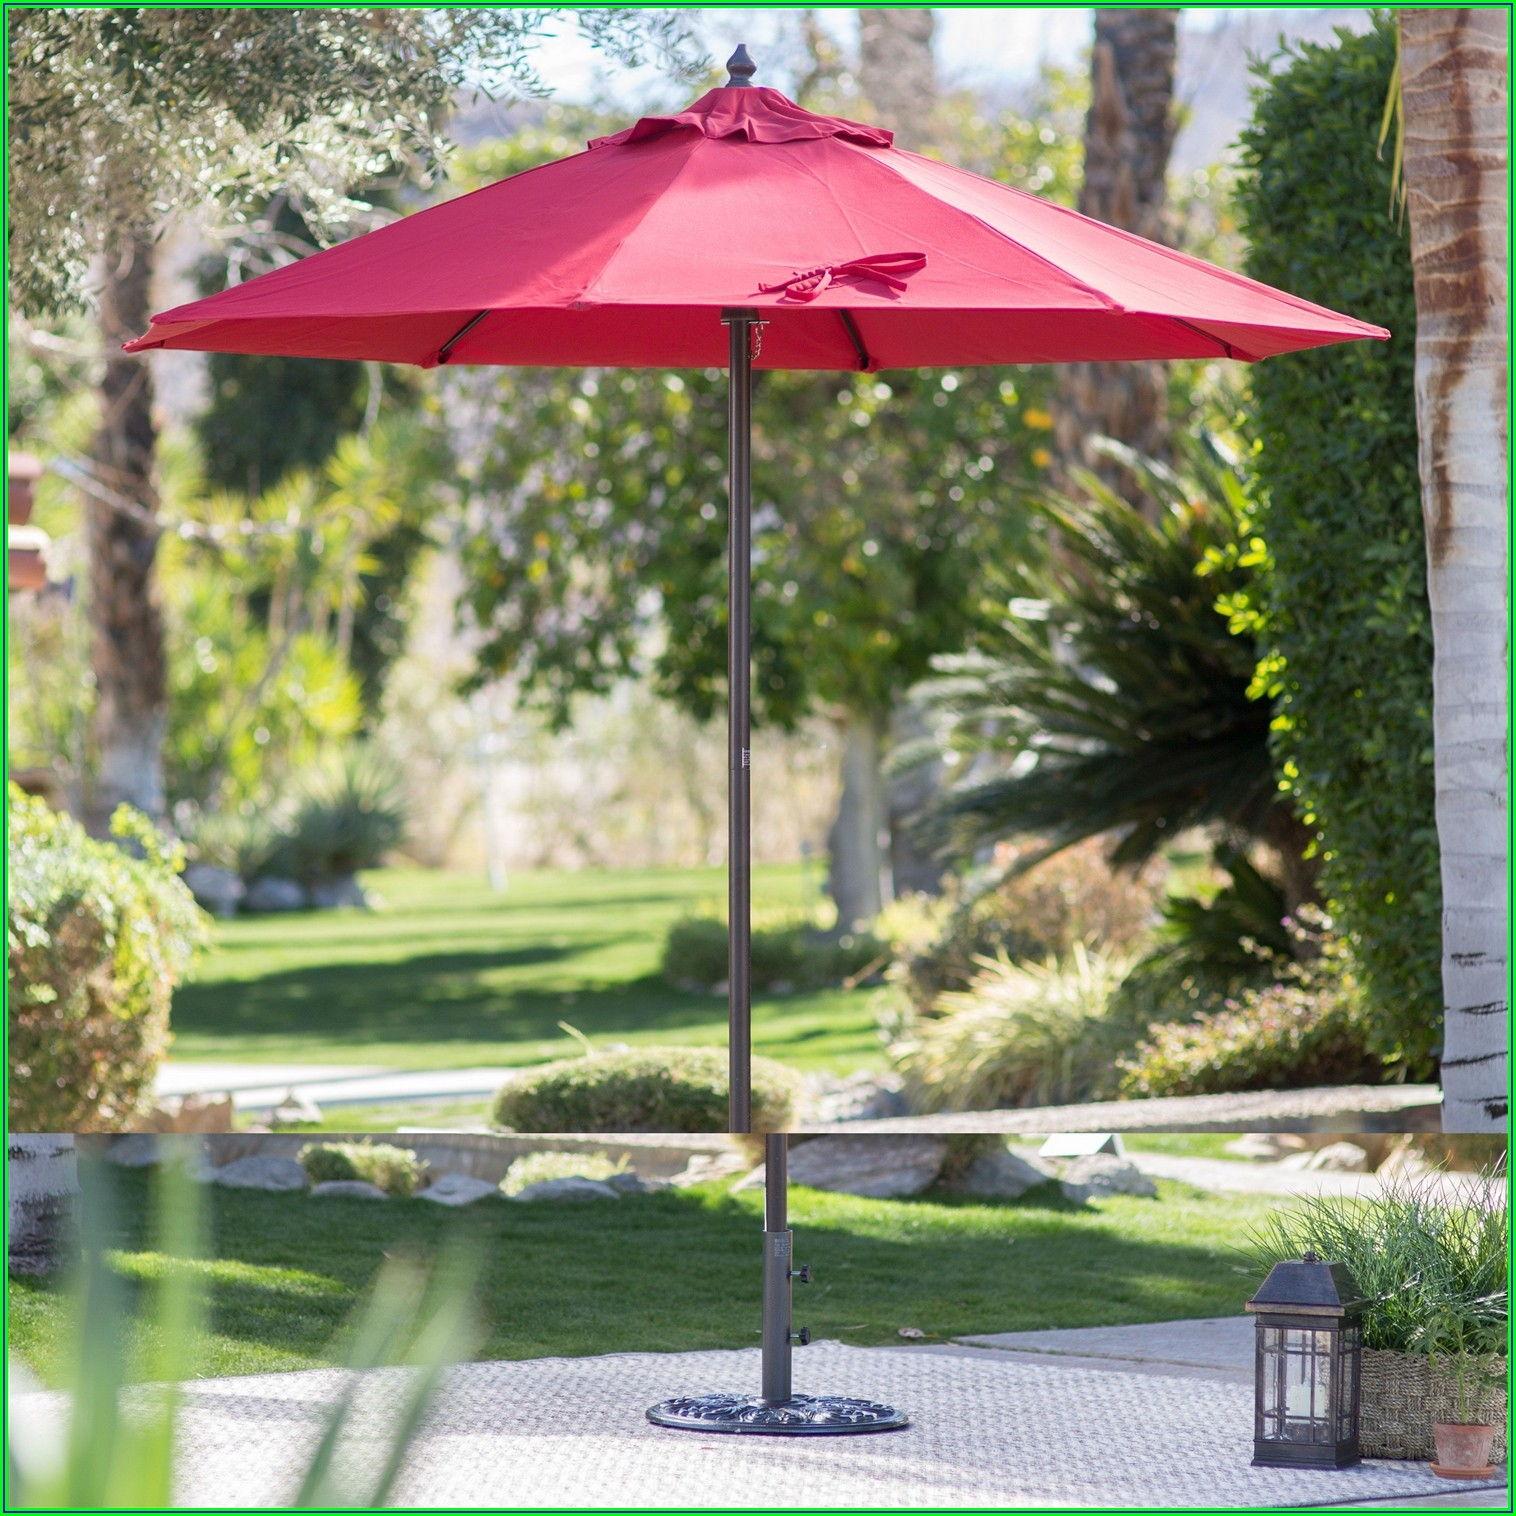 Red Patio Umbrella With White Pole